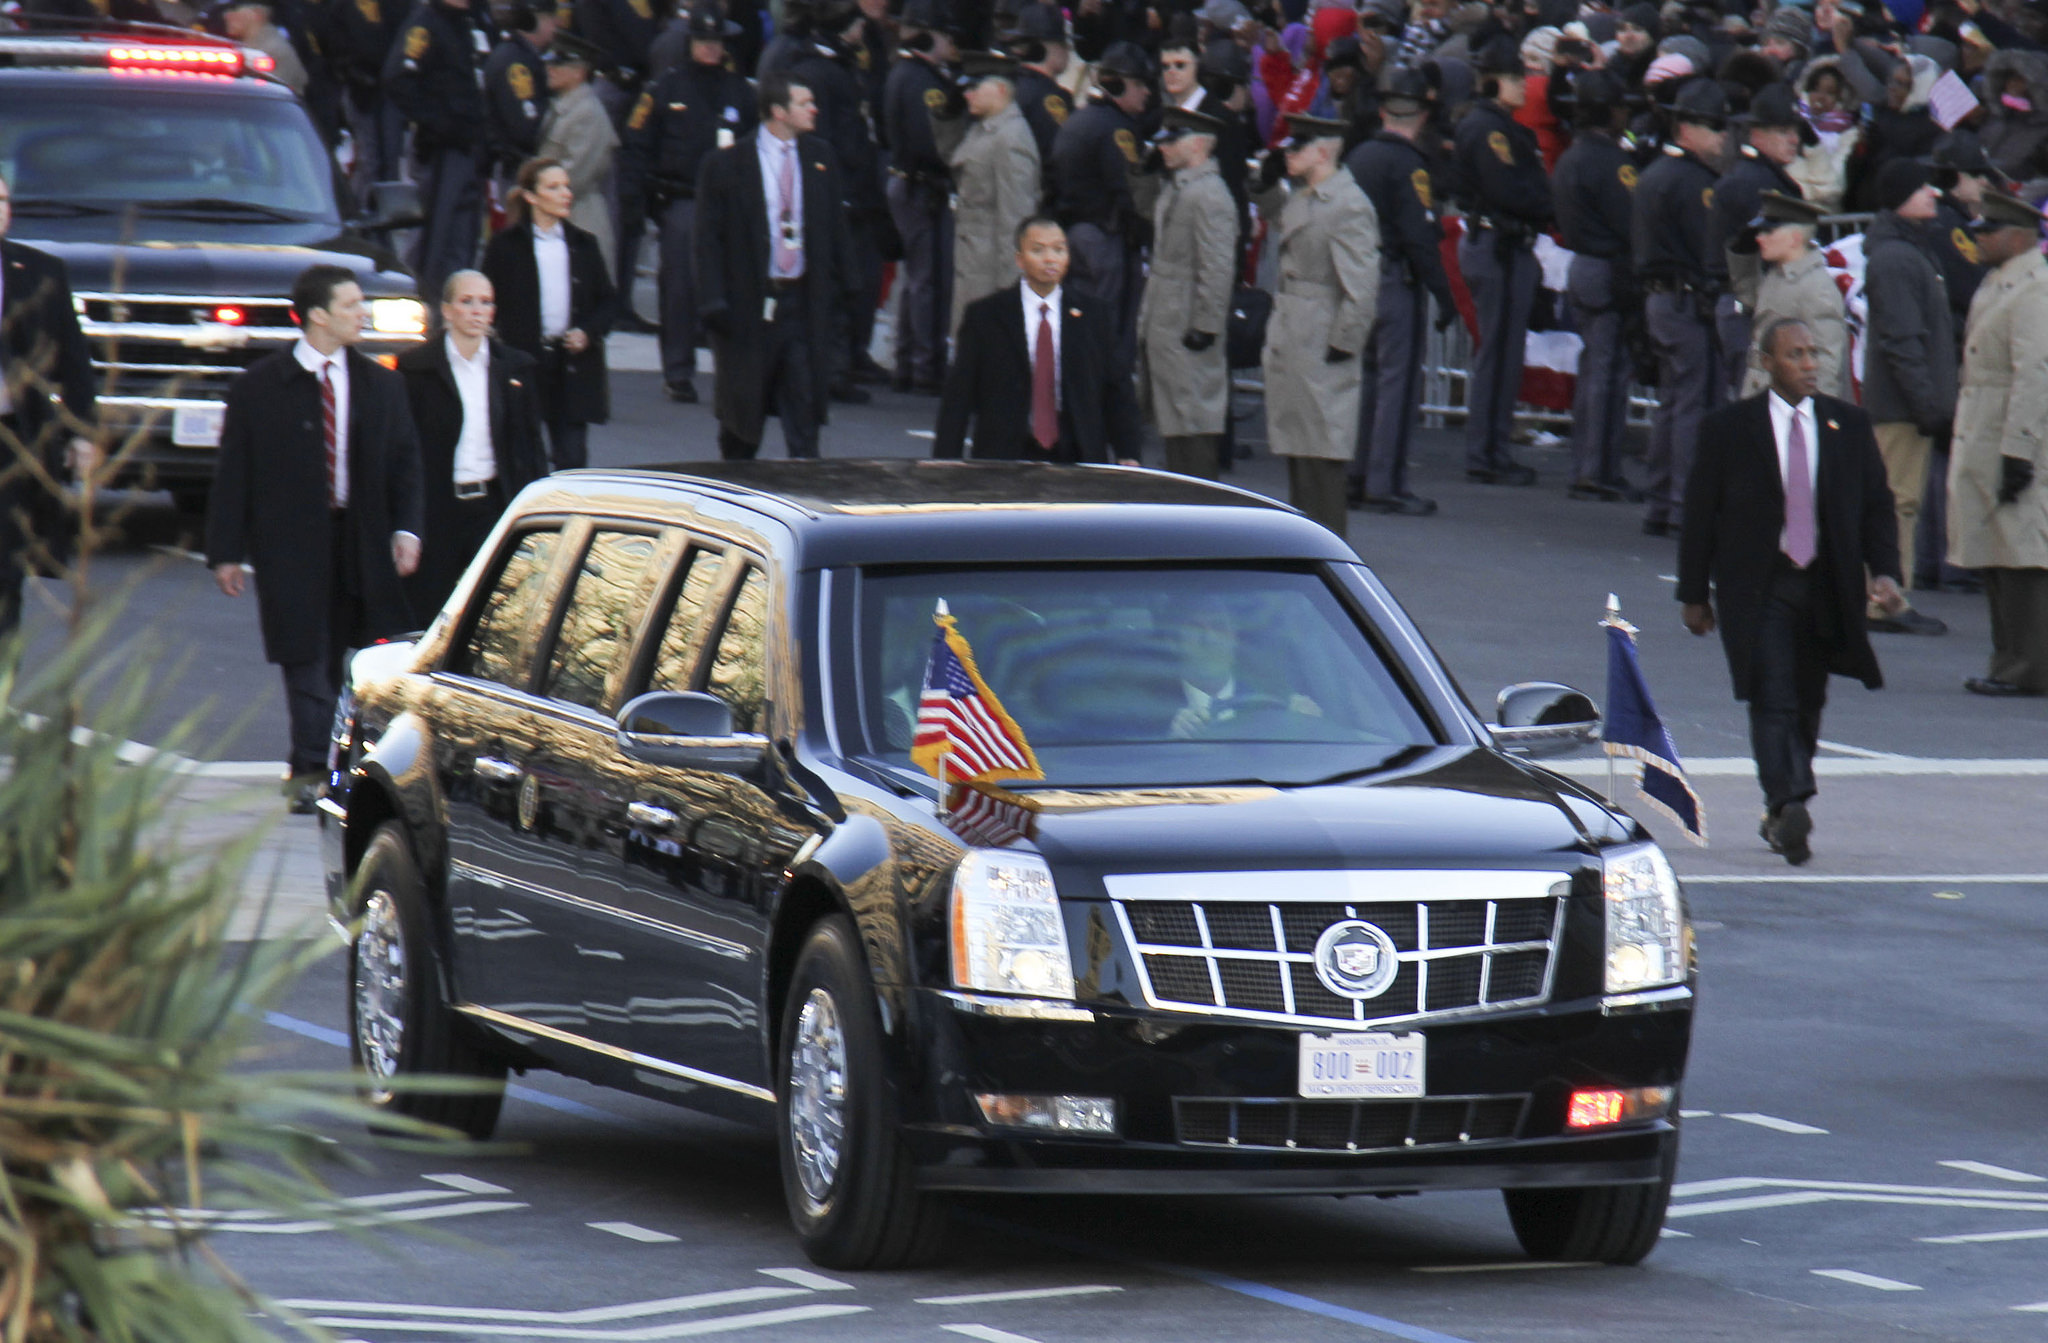 President Obama 2013 Inauguration